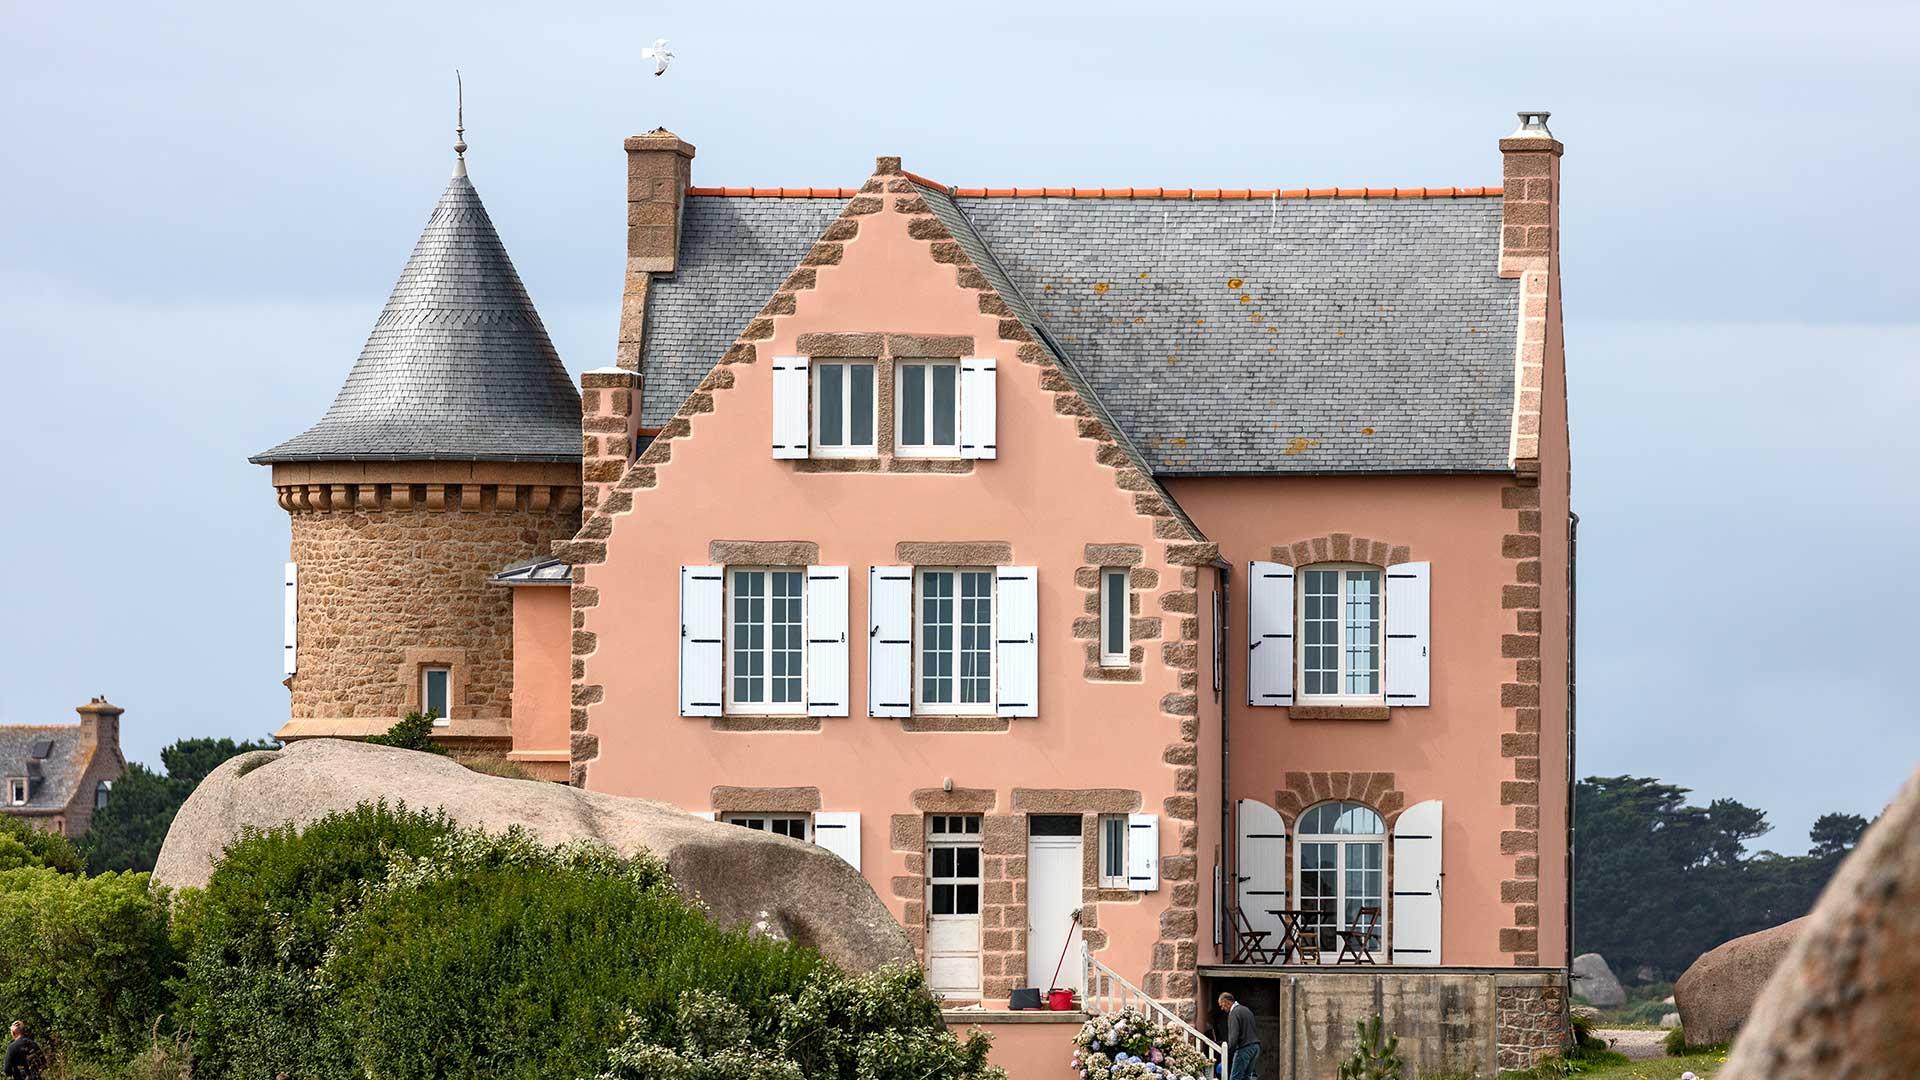 Landschaftsfotografie: Côte de Granit Rose – Eiffelhaus | Foto: Dieter Eikenberg, imprints